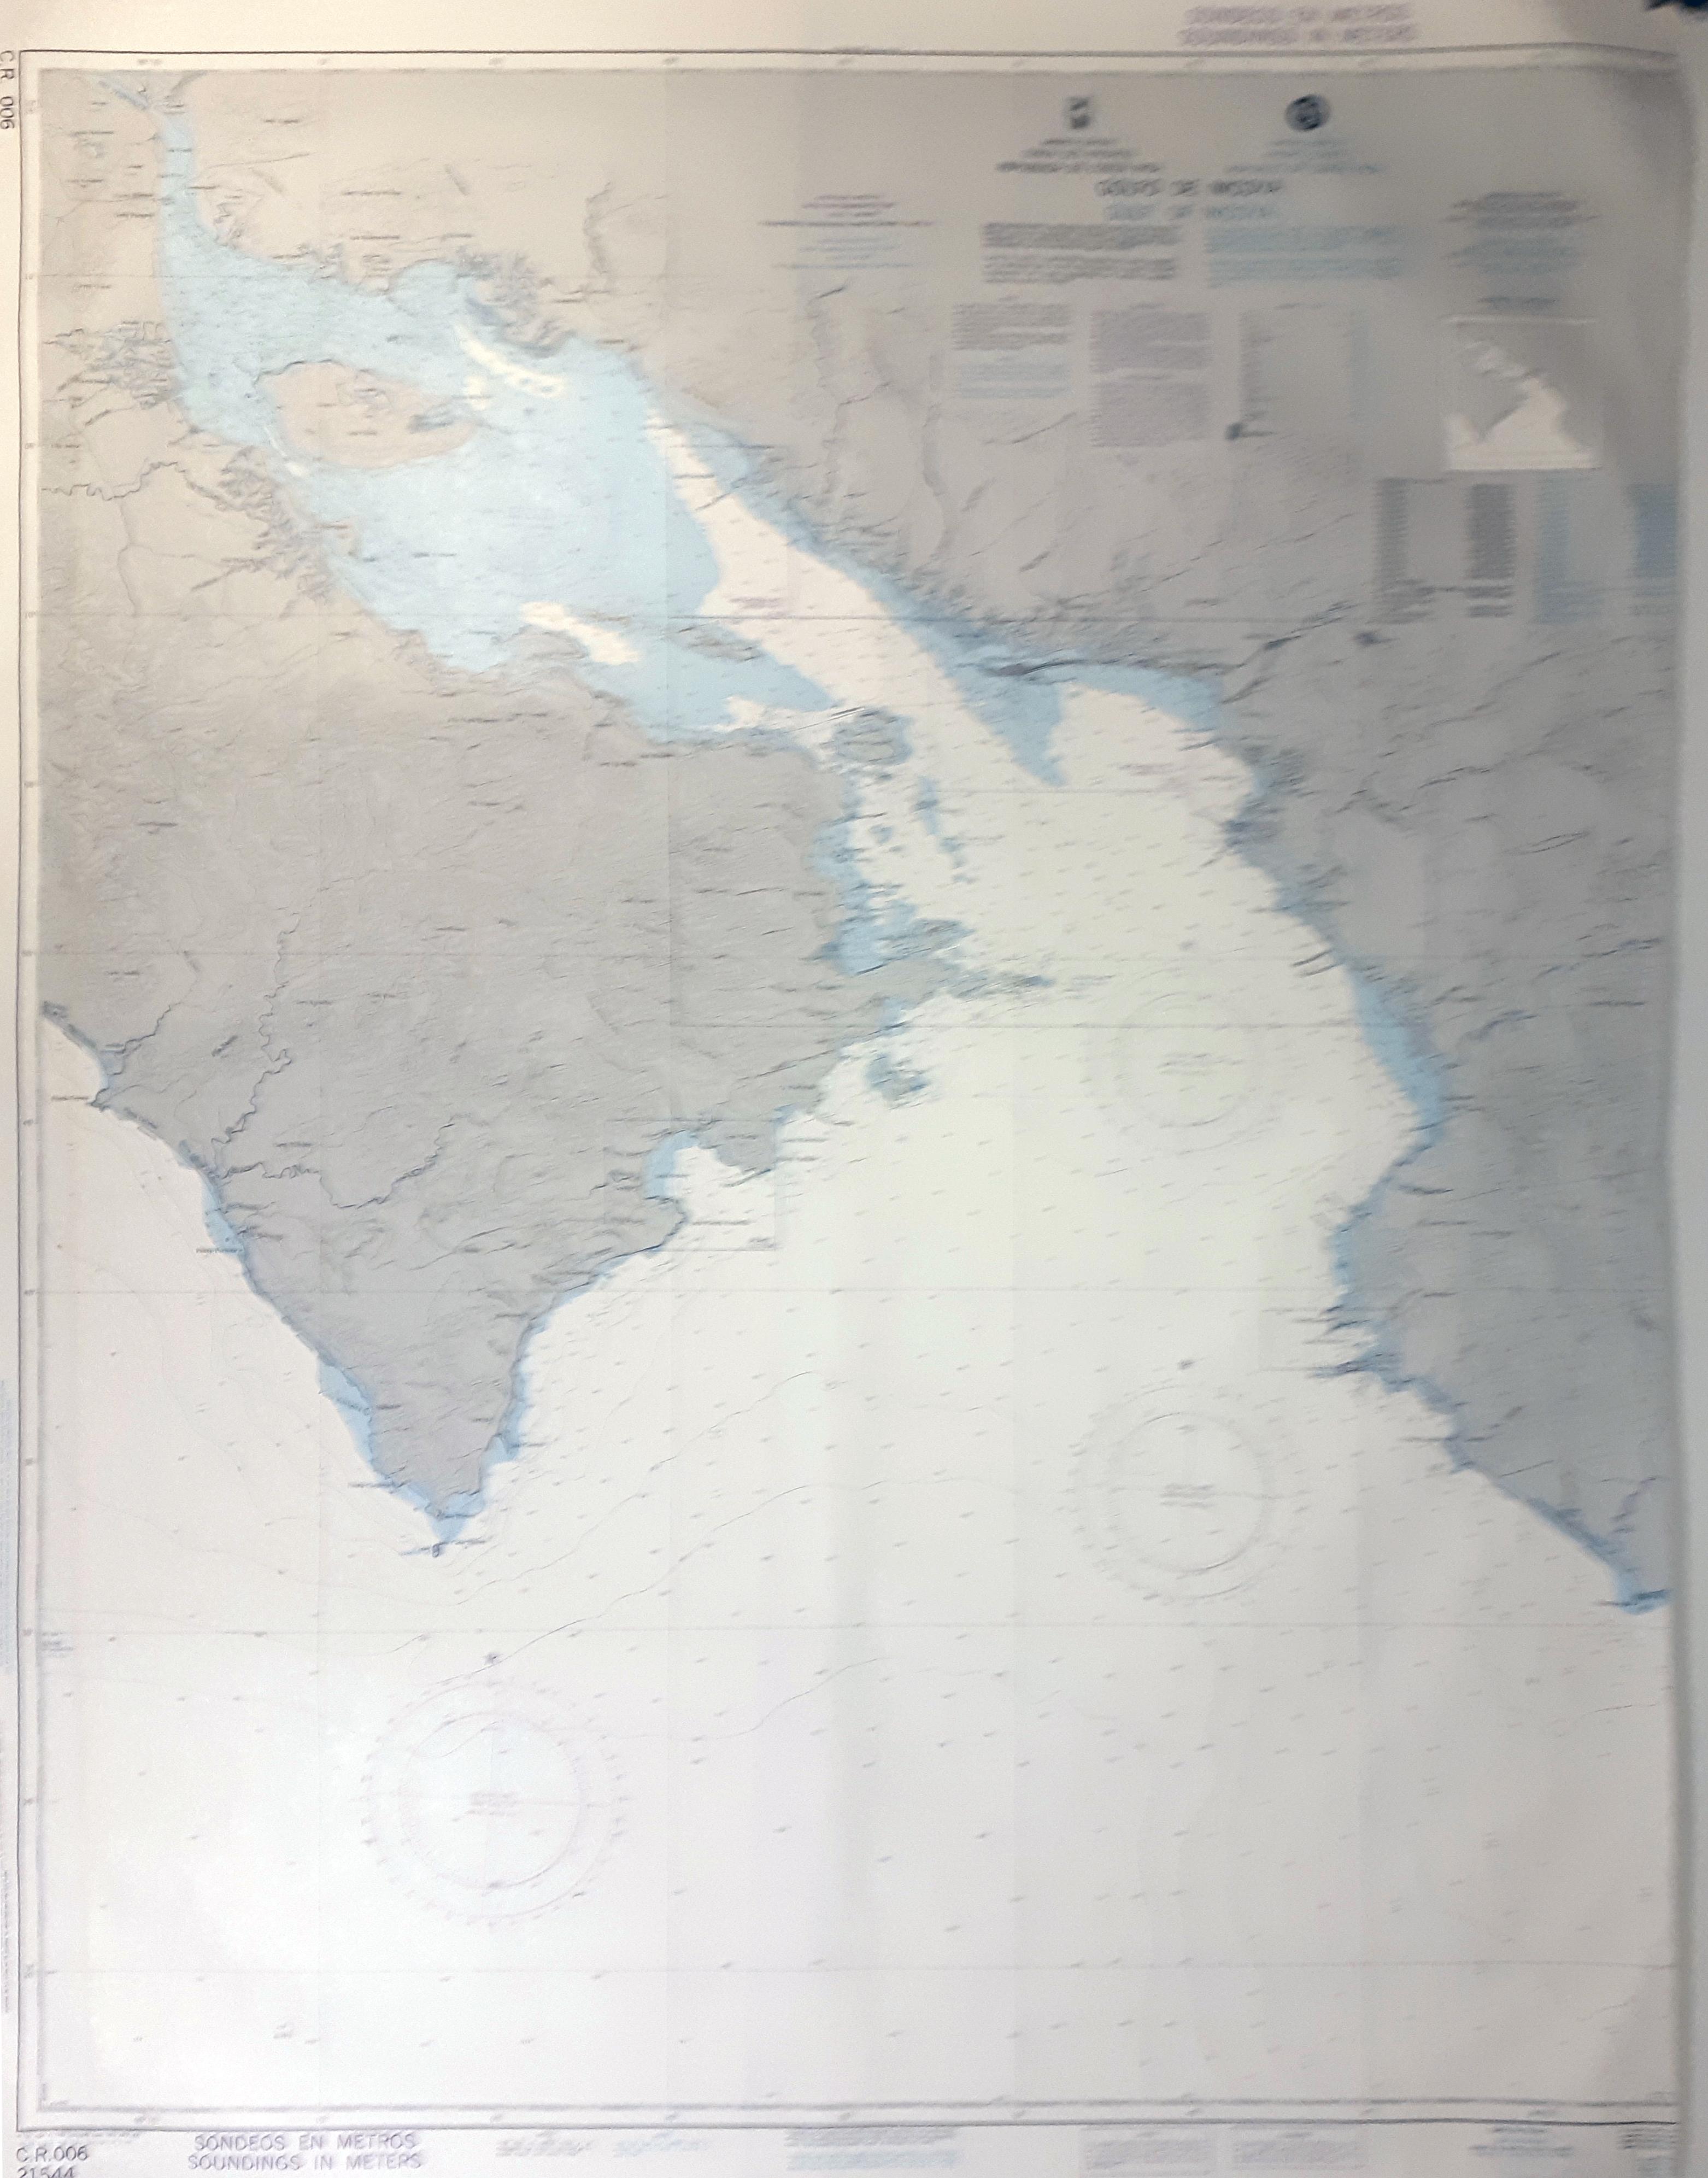 69.  Gulf of Nicoya